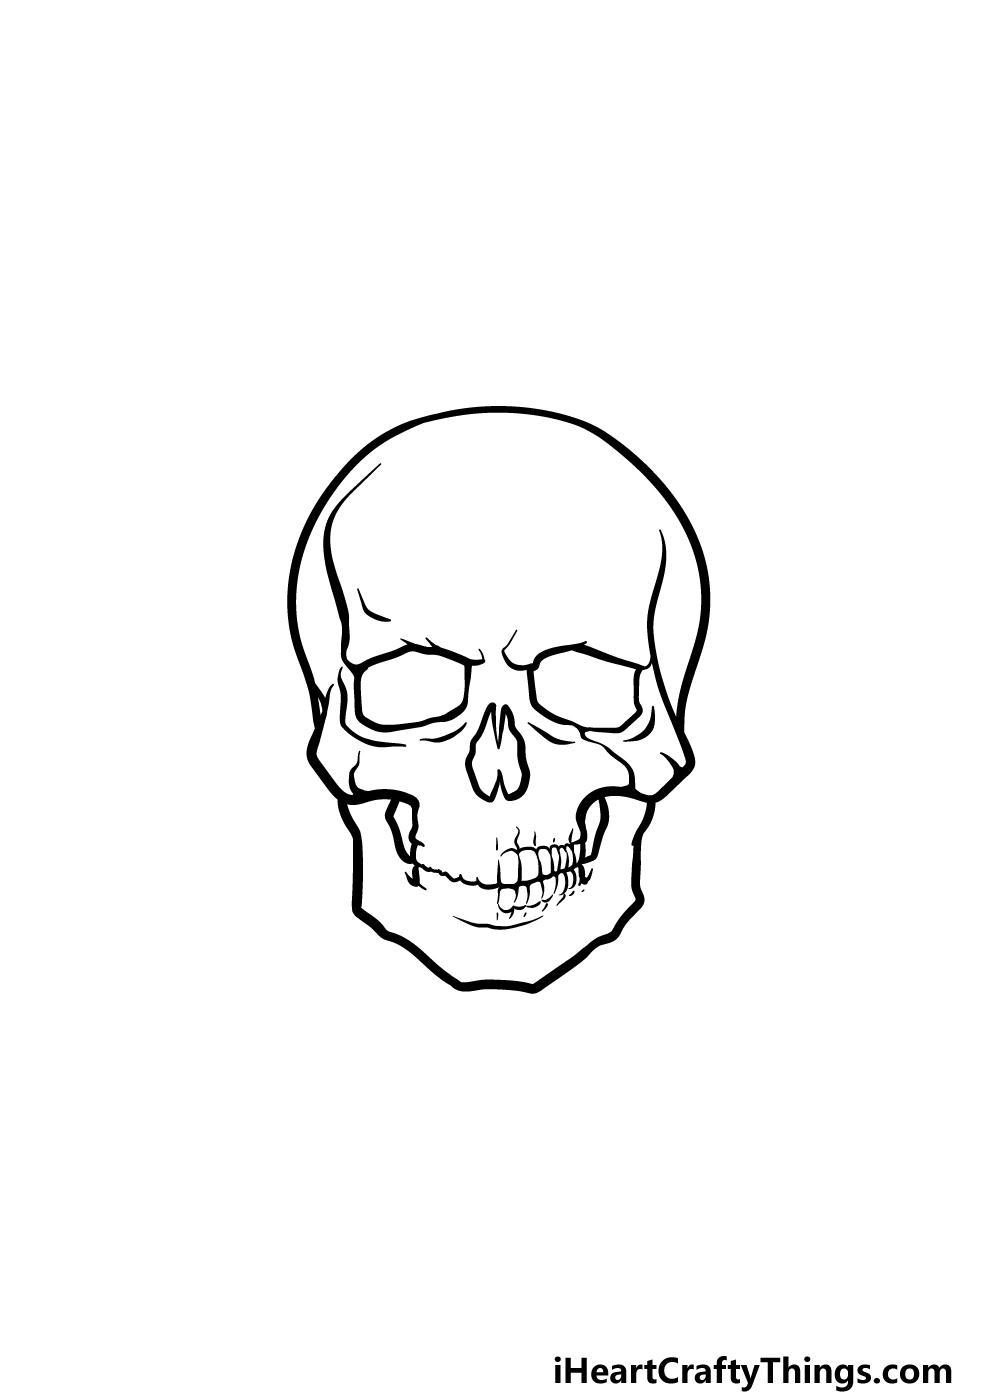 drawing a skeleton head step 3